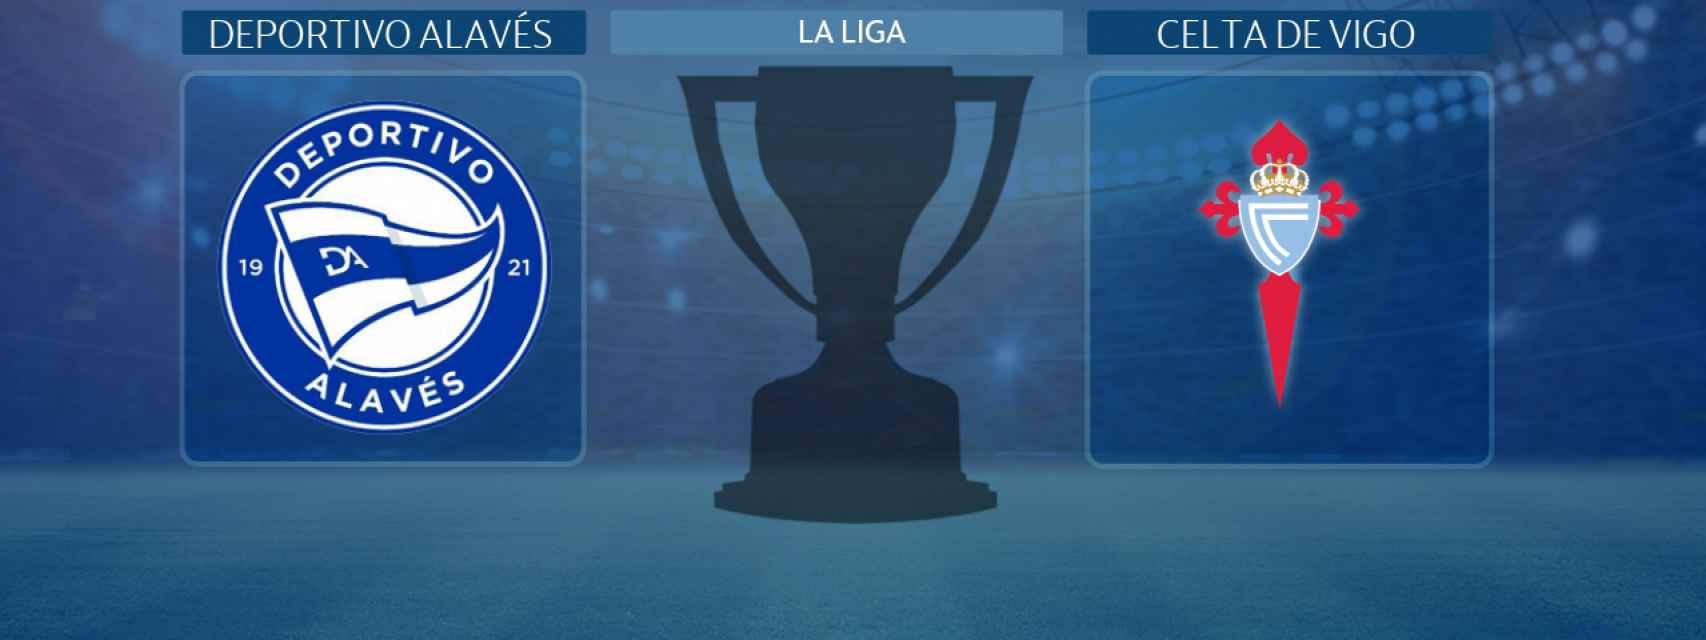 Deportivo Alavés - Celta de Vigo, partido de La Liga